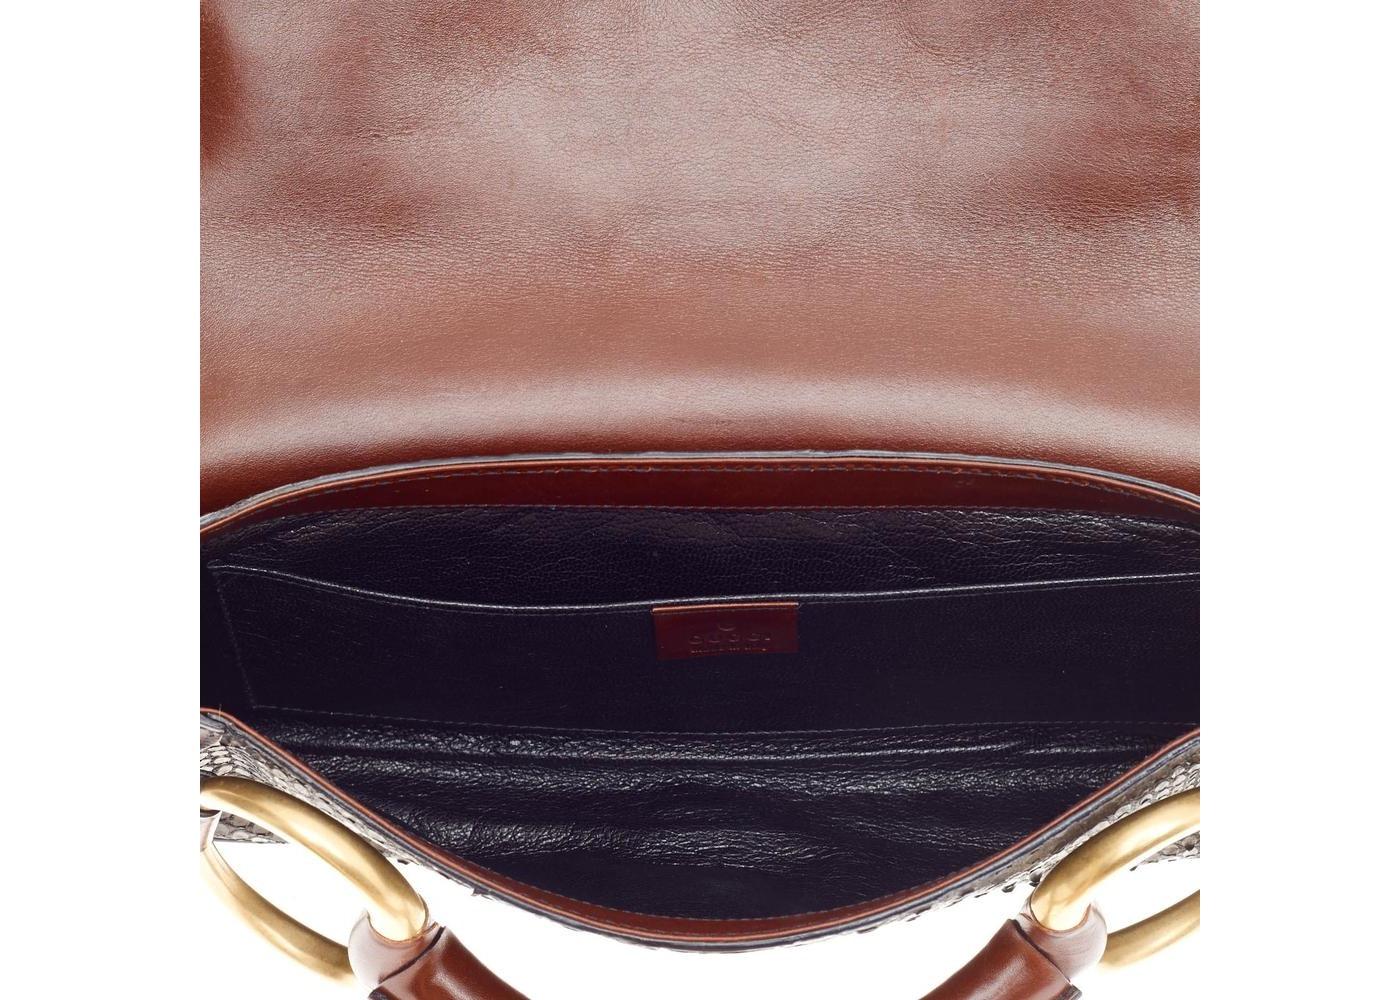 e56b18e027ee94 Gucci Horsebit Clutch GG Large Black/Wine Red